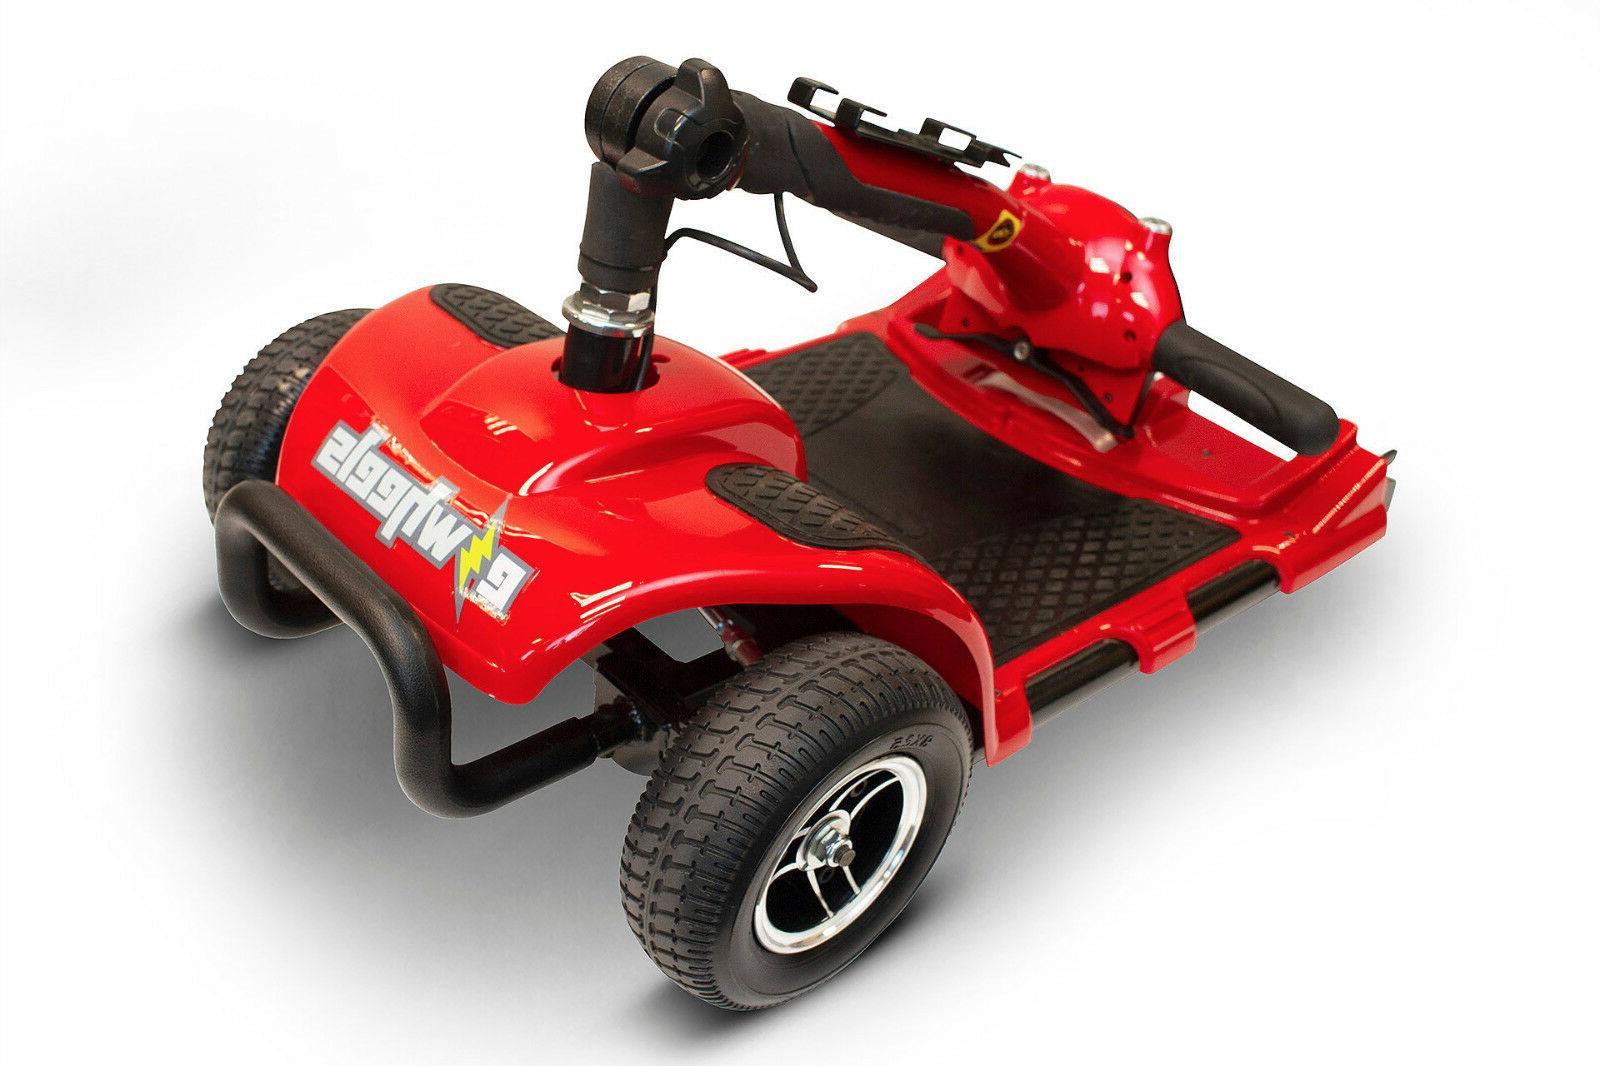 eWheels Lightweight Mobility Scooter 300Lbs